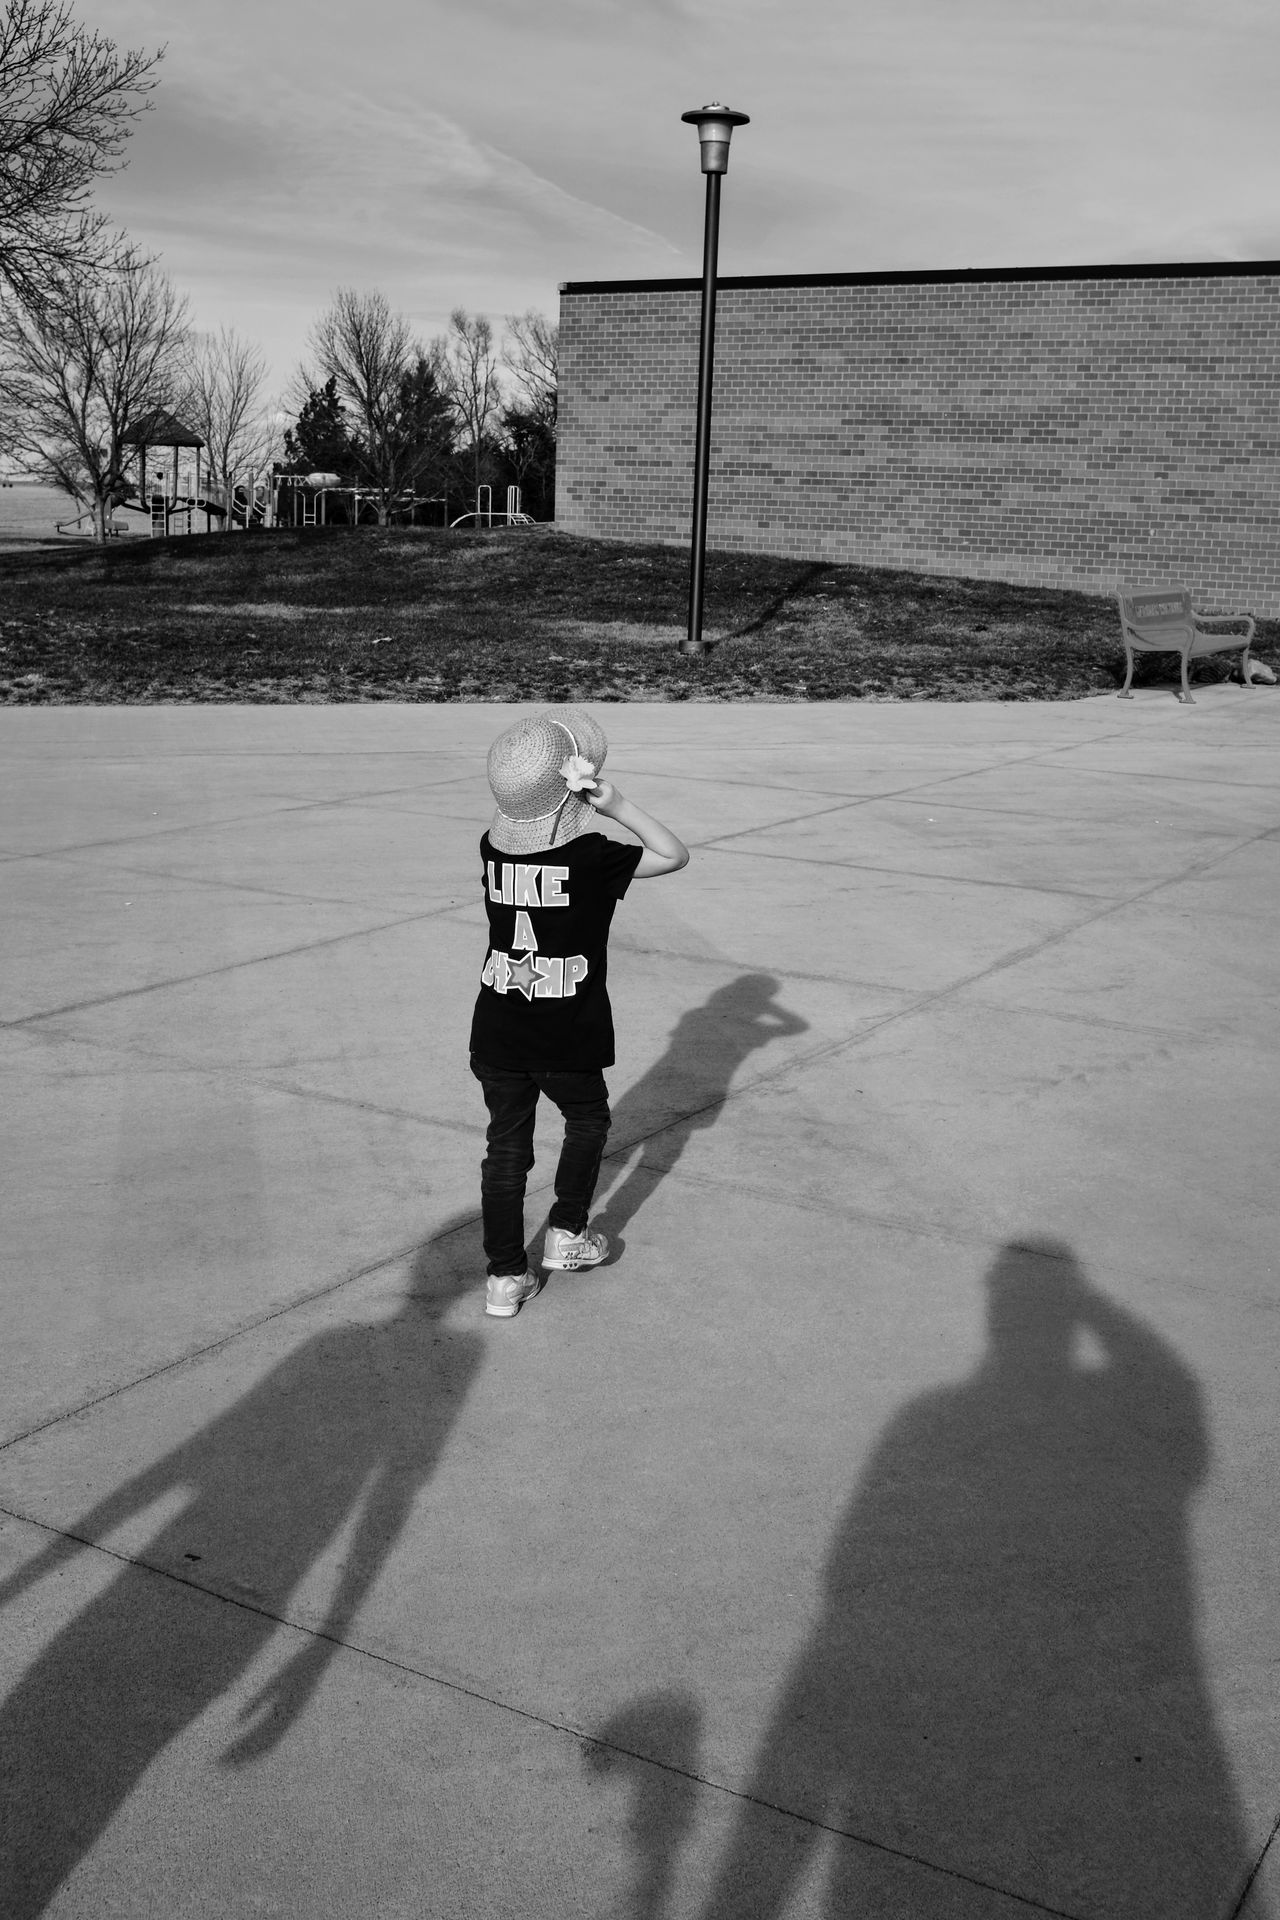 Visual Journal March 17, 2017 Daykin, Nebraska Black & White Candid Portraits Composition Day Everyday Lives EyeEm Best Shots - Black + White EyeEm Gallery EyeEmBestPics FUJIFILM X100S Full Length Kids Being Kids Kids Of EyeEm Lifestyles Me And My Shadow Outdoors Photo Diary Preschool Age Real People Rural America School Small Town Stories Storytelling Sunlight Visual Journal Walking